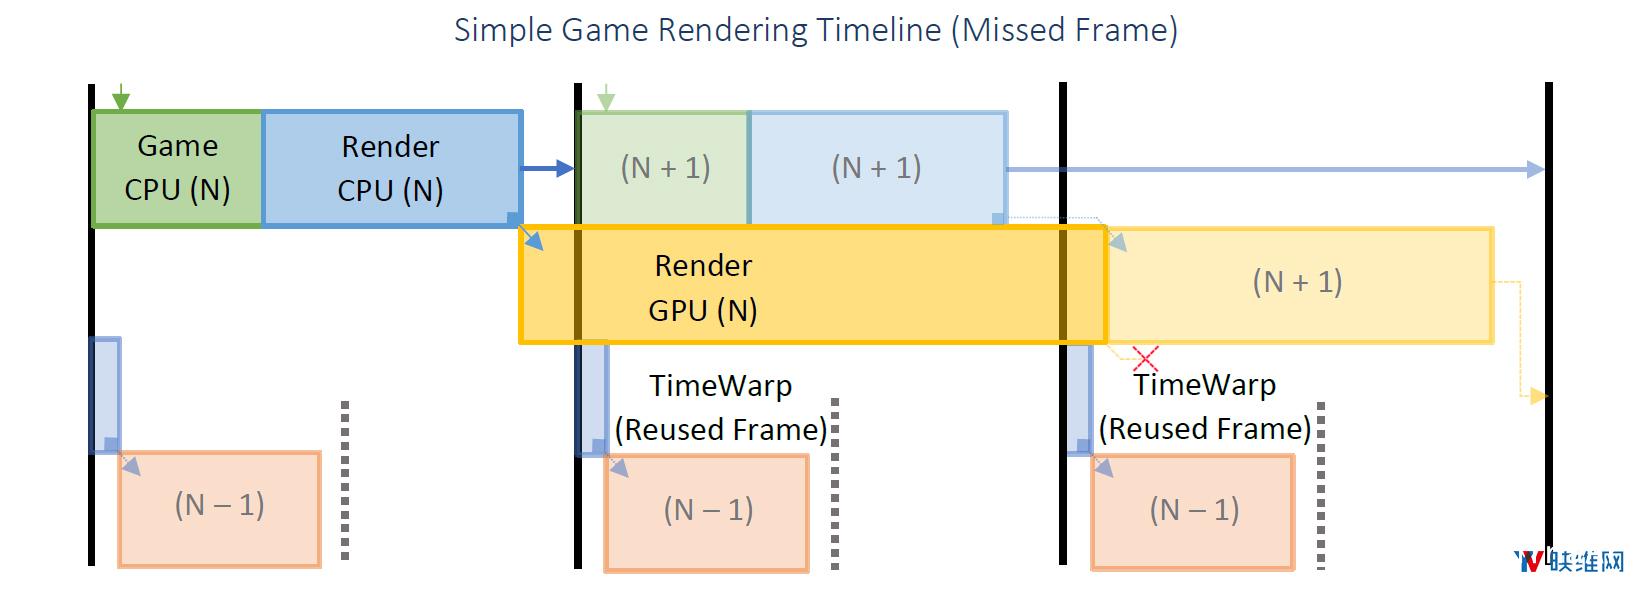 Oculus详述『延迟』问题及对应『帧渲染』解决方案 资源教程 第4张